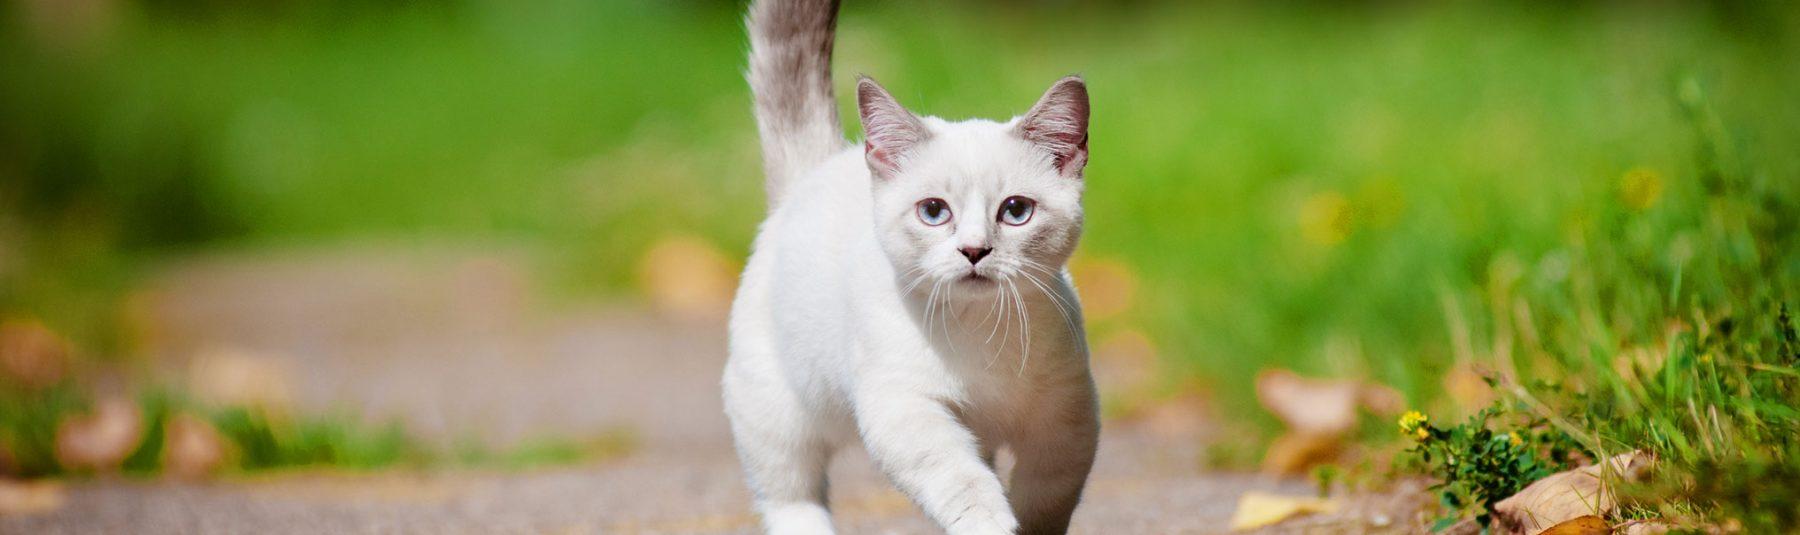 killarney-cat-services